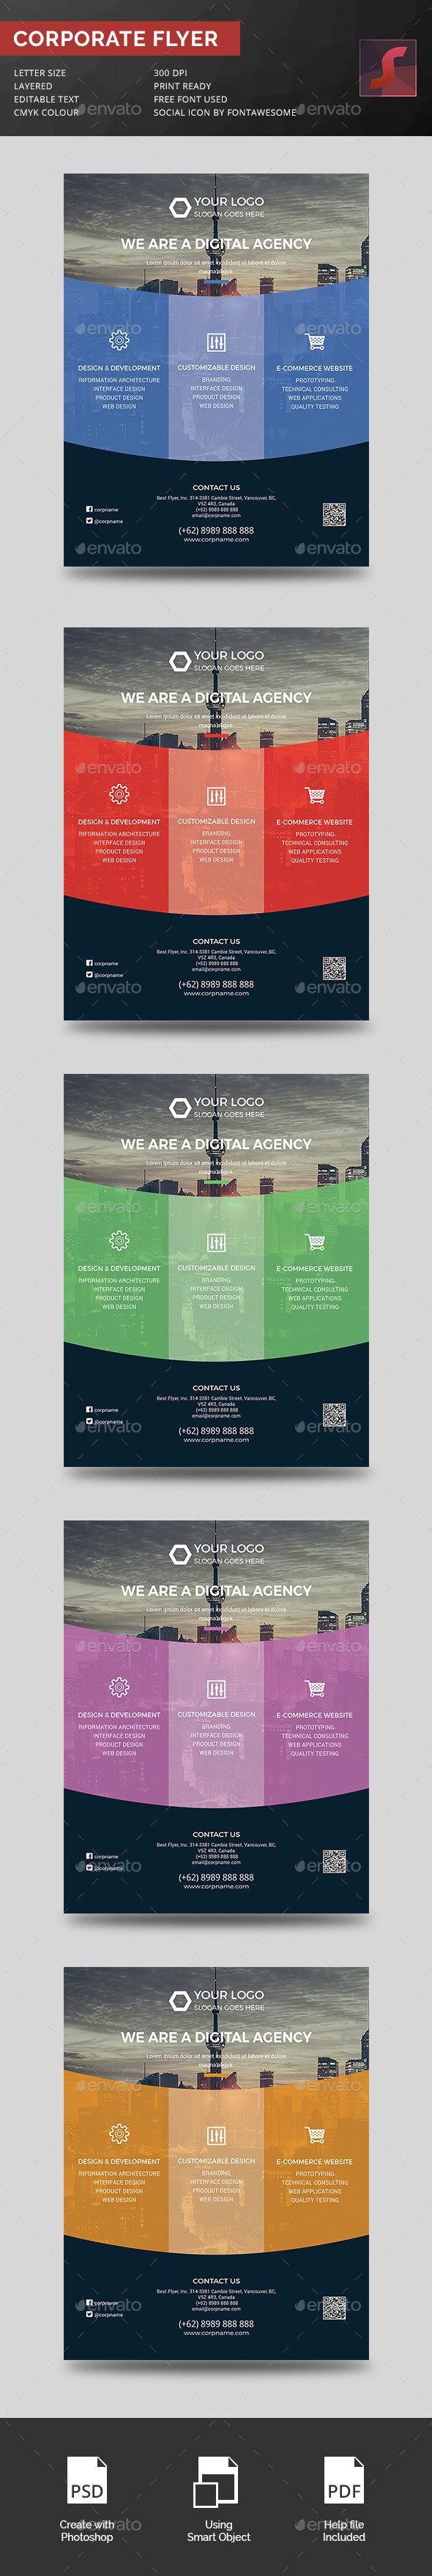 Corporate Digital Agency Flyer - Corporate Flyers